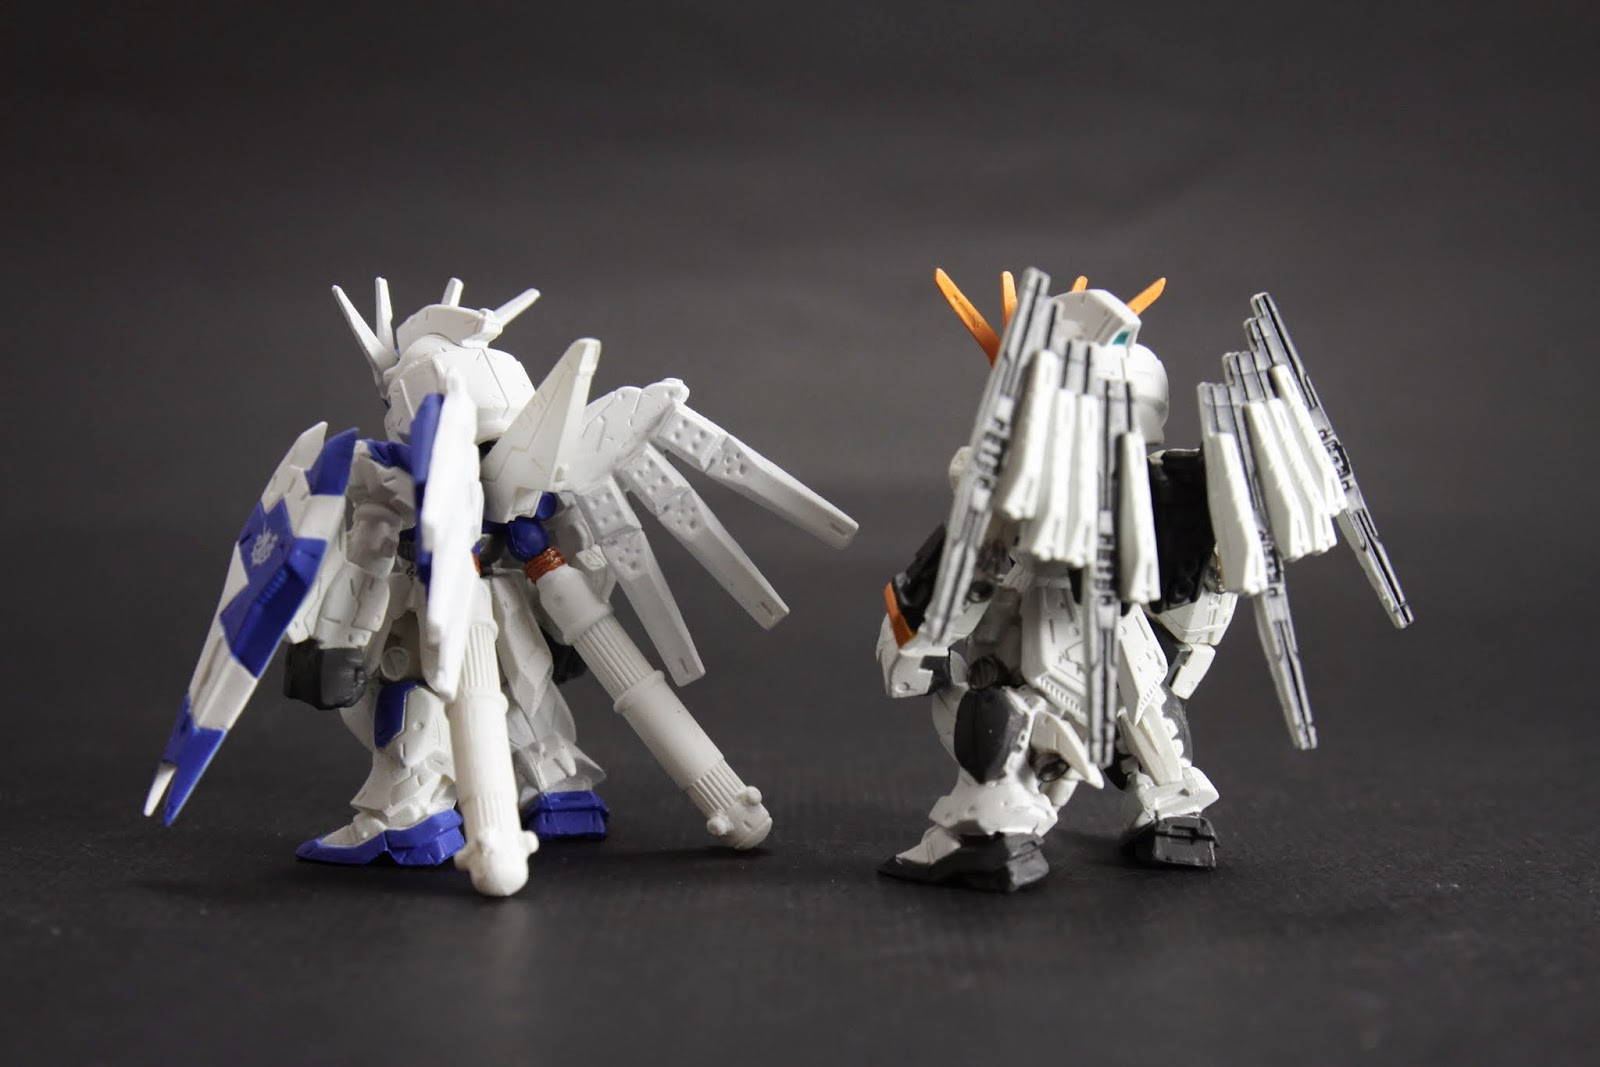 Hi-Nu可惜的是背後的平衡翼是MG新設定 但就Fin-Funnel來說我還是比較喜歡Nu的